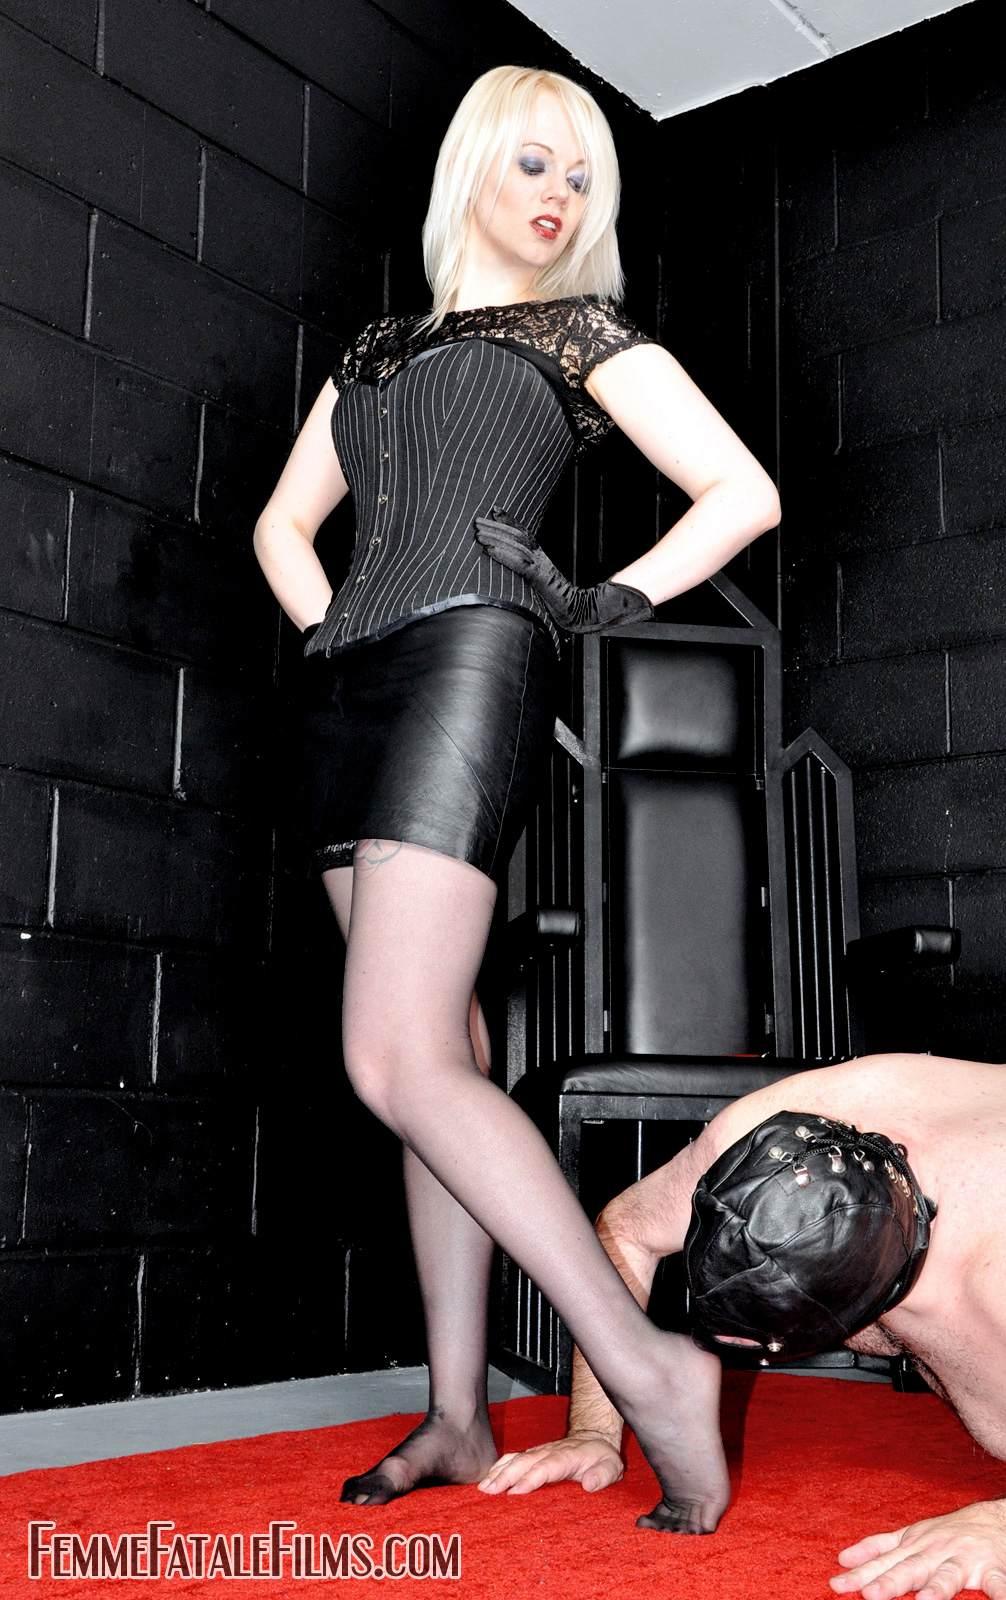 Раб целует ноги госпажи фото 14 фотография